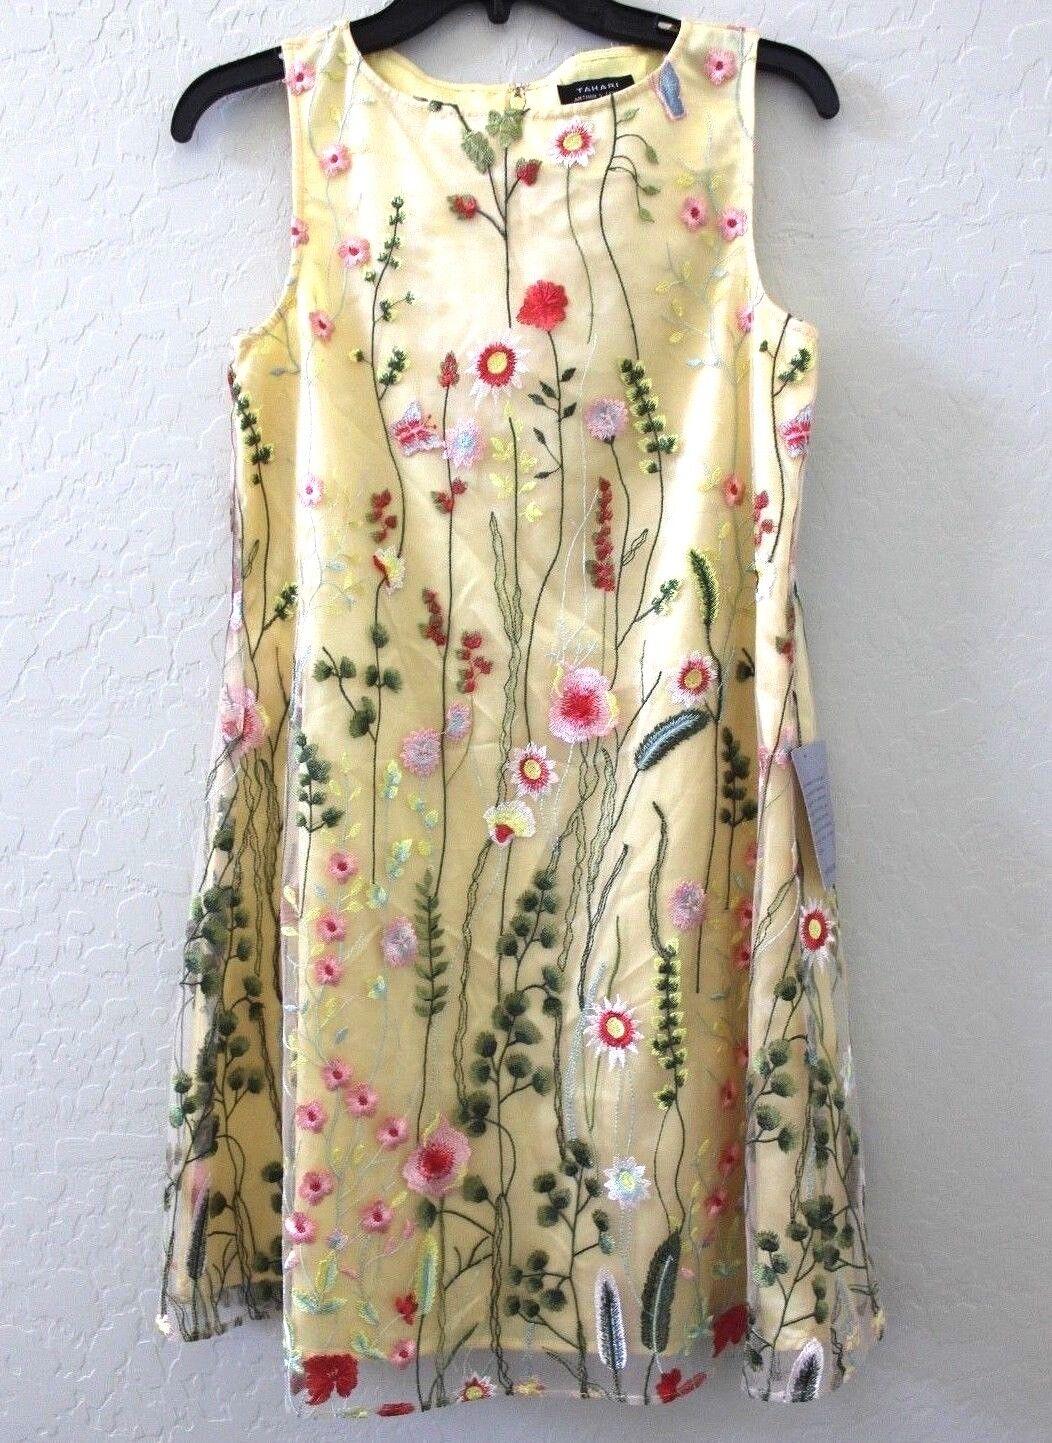 TAHARI ASL Gold Gelb Sleeveless Floral Embroiderot Shift Dress Größe 2